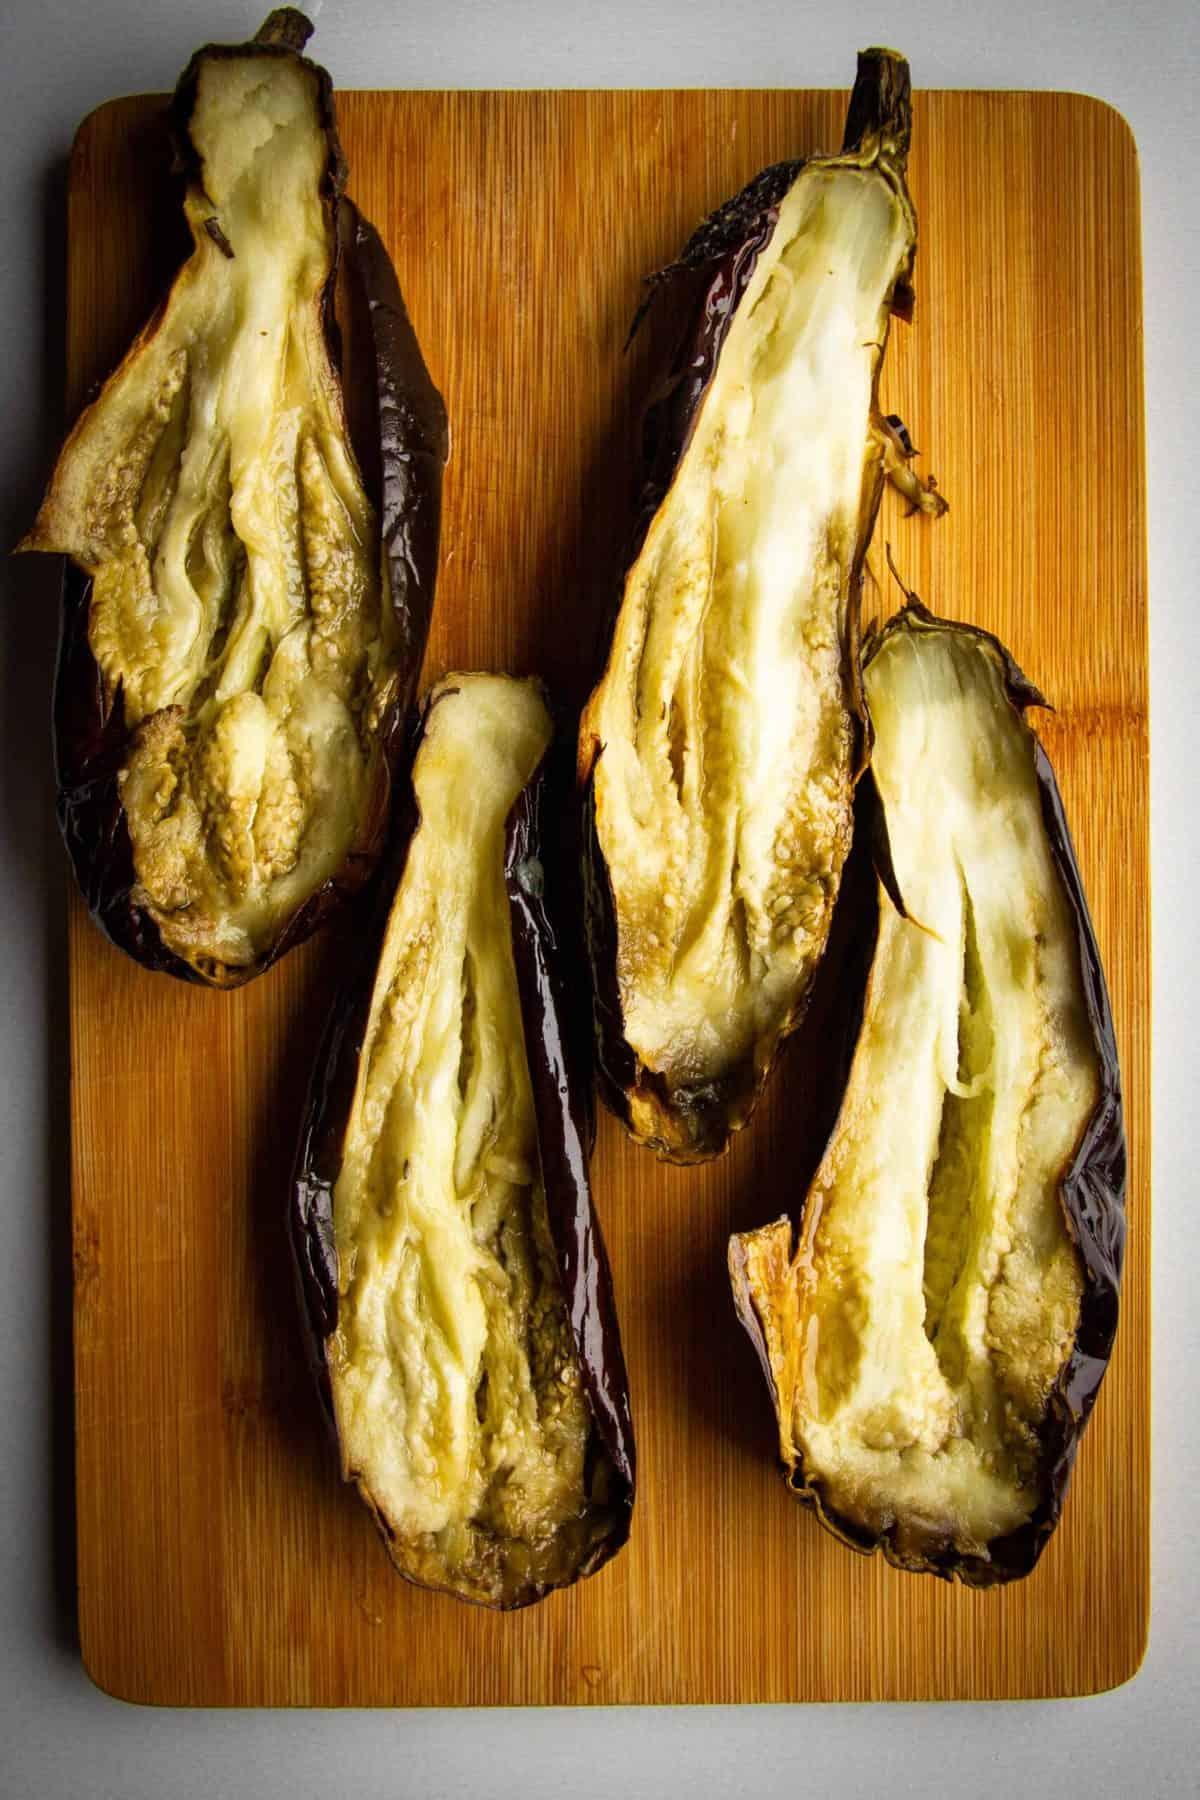 The roasted eggplants split in half on a board.